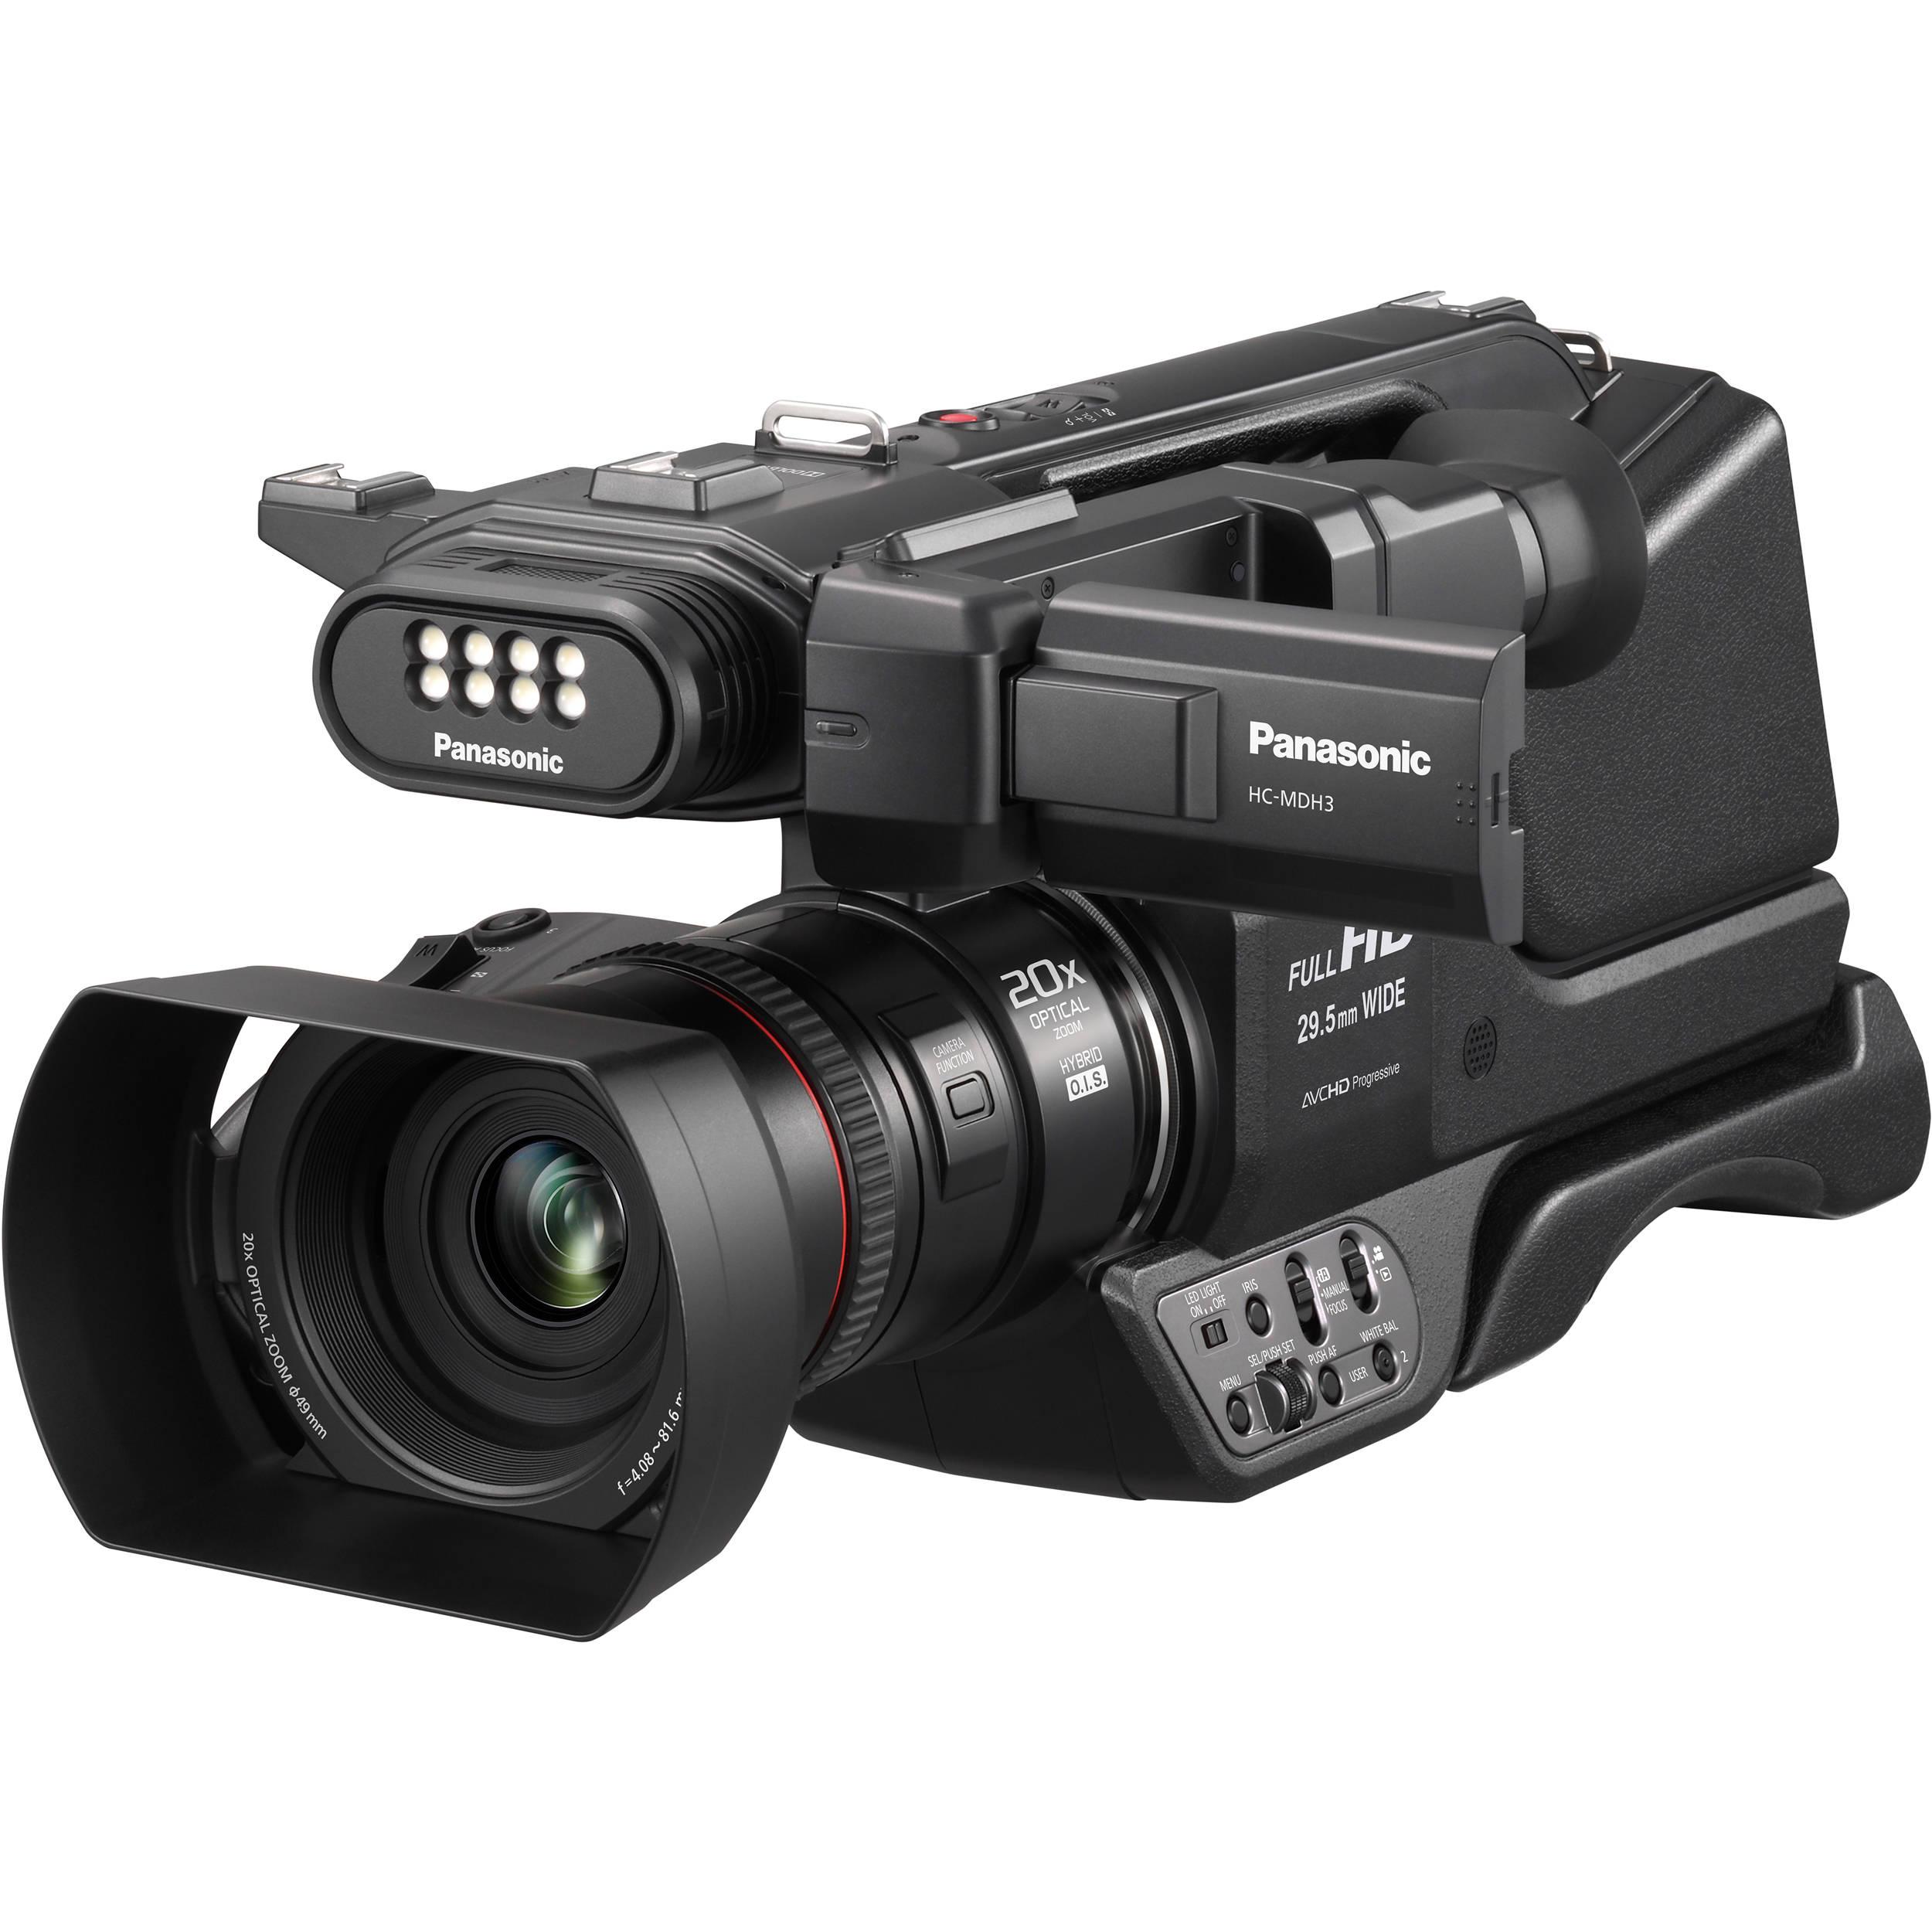 e901f7e8bf37 Panasonic HC-MDH3 AVCHD Shoulder Mount Camcorder with LCD Touchscreen   LED  Light